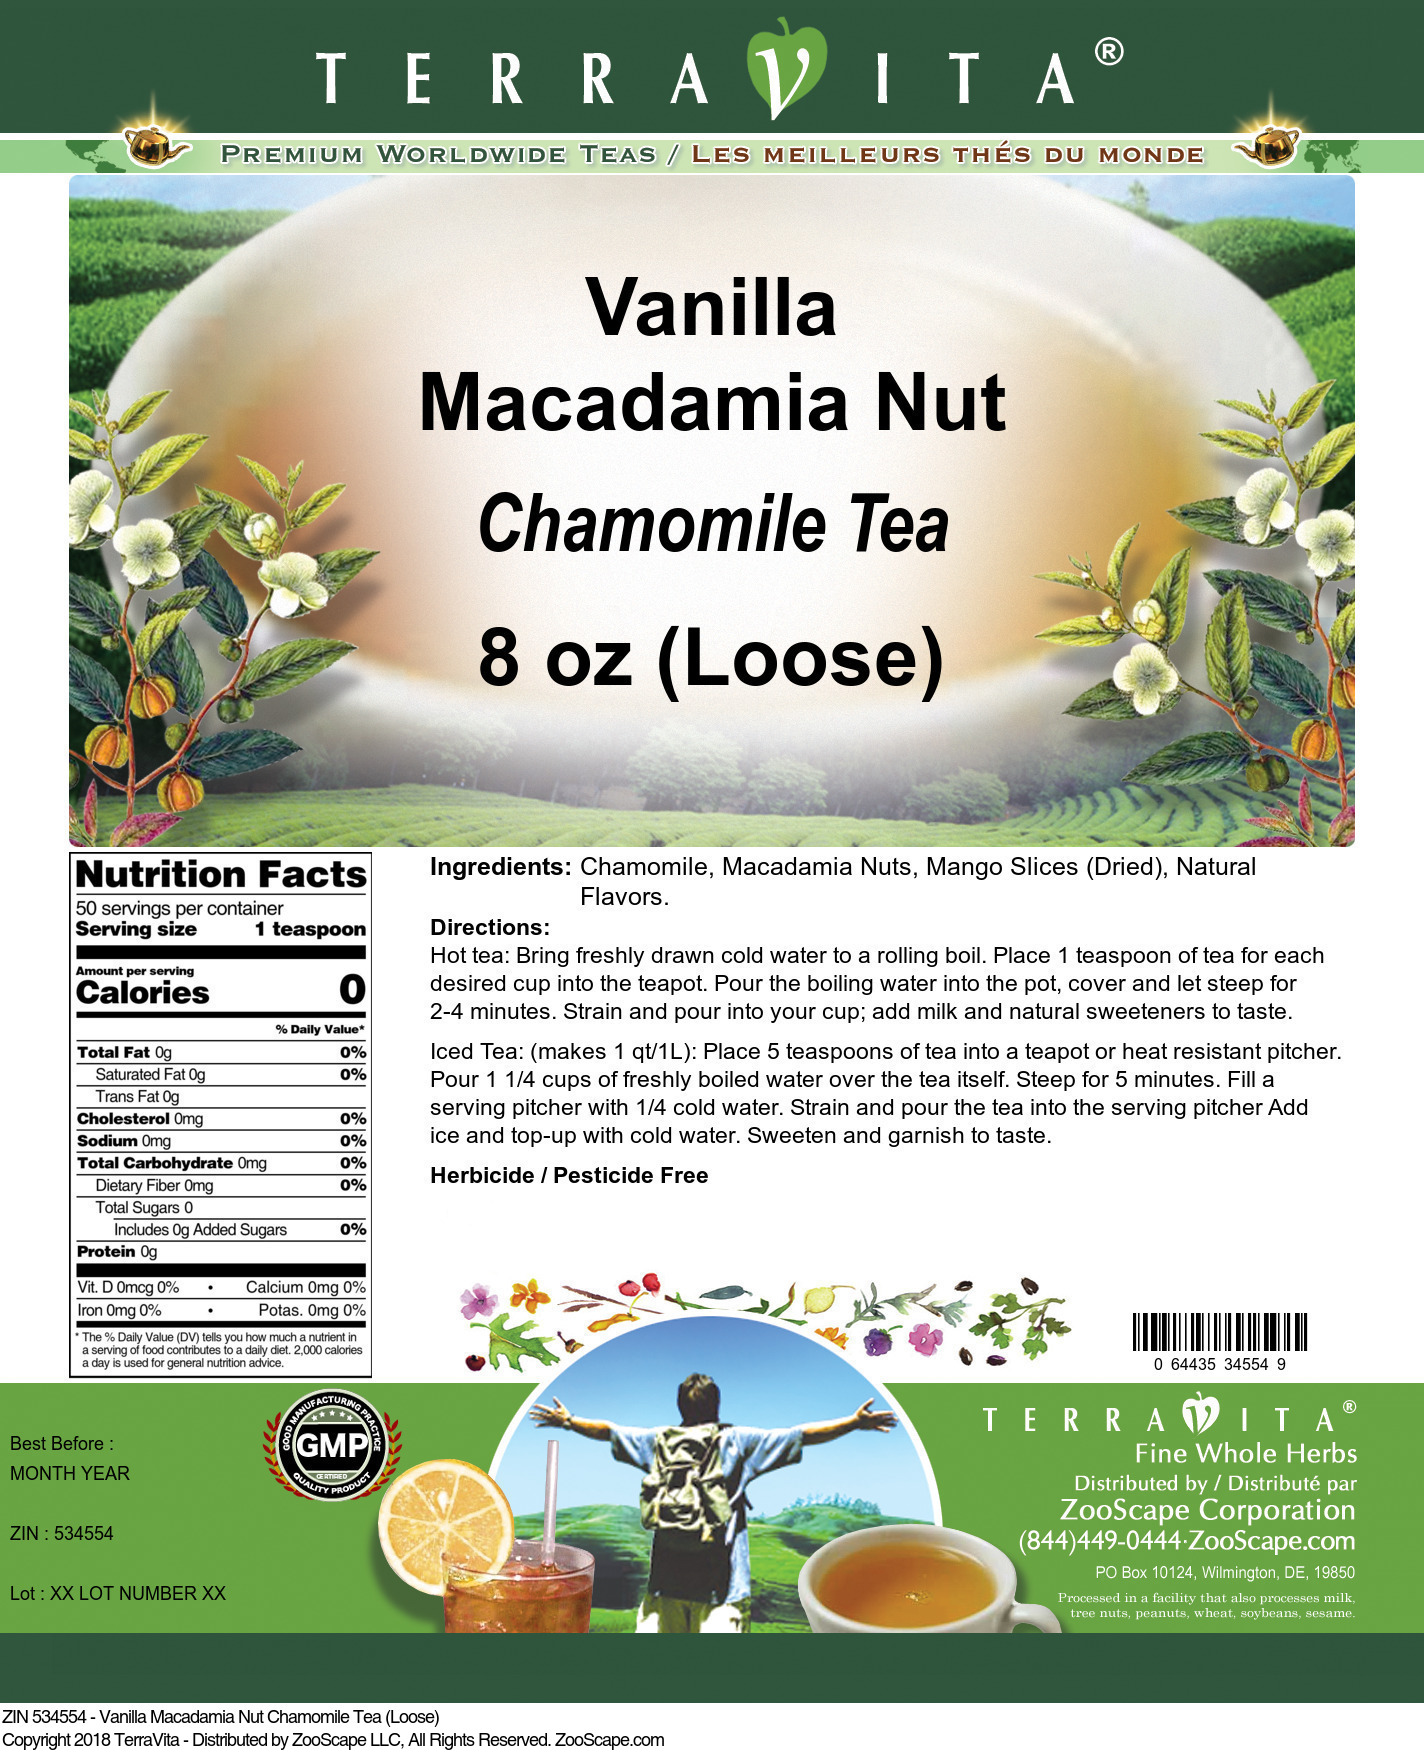 Vanilla Macadamia Nut Chamomile Tea